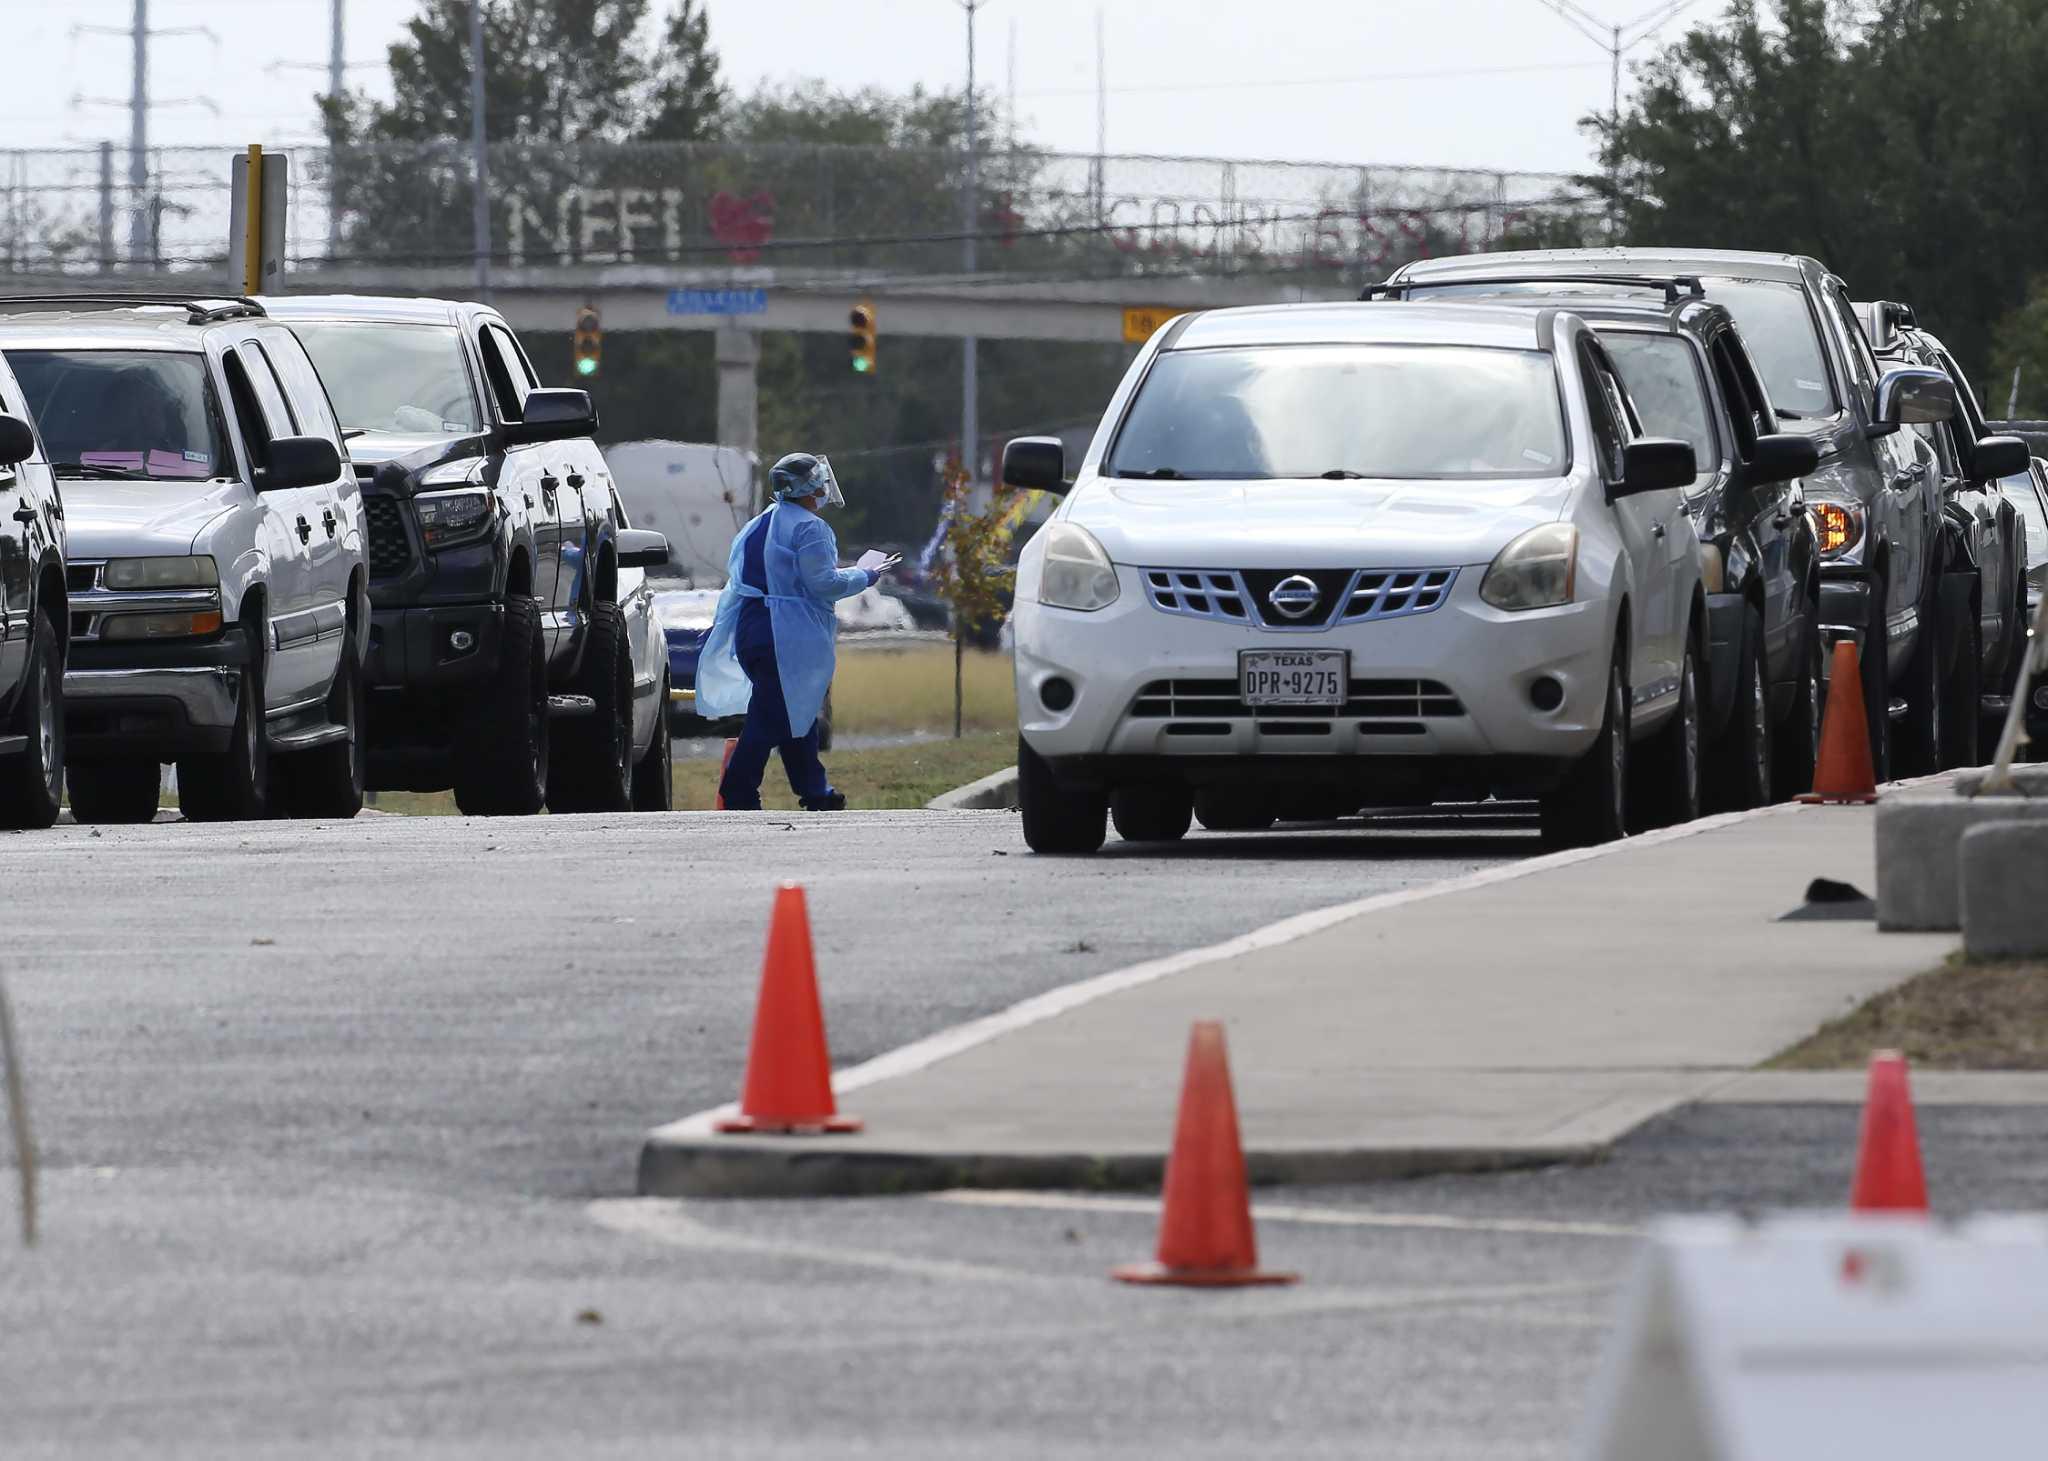 San Antonio hospitals taking patients from El Paso to relieve COVID-19 crisis